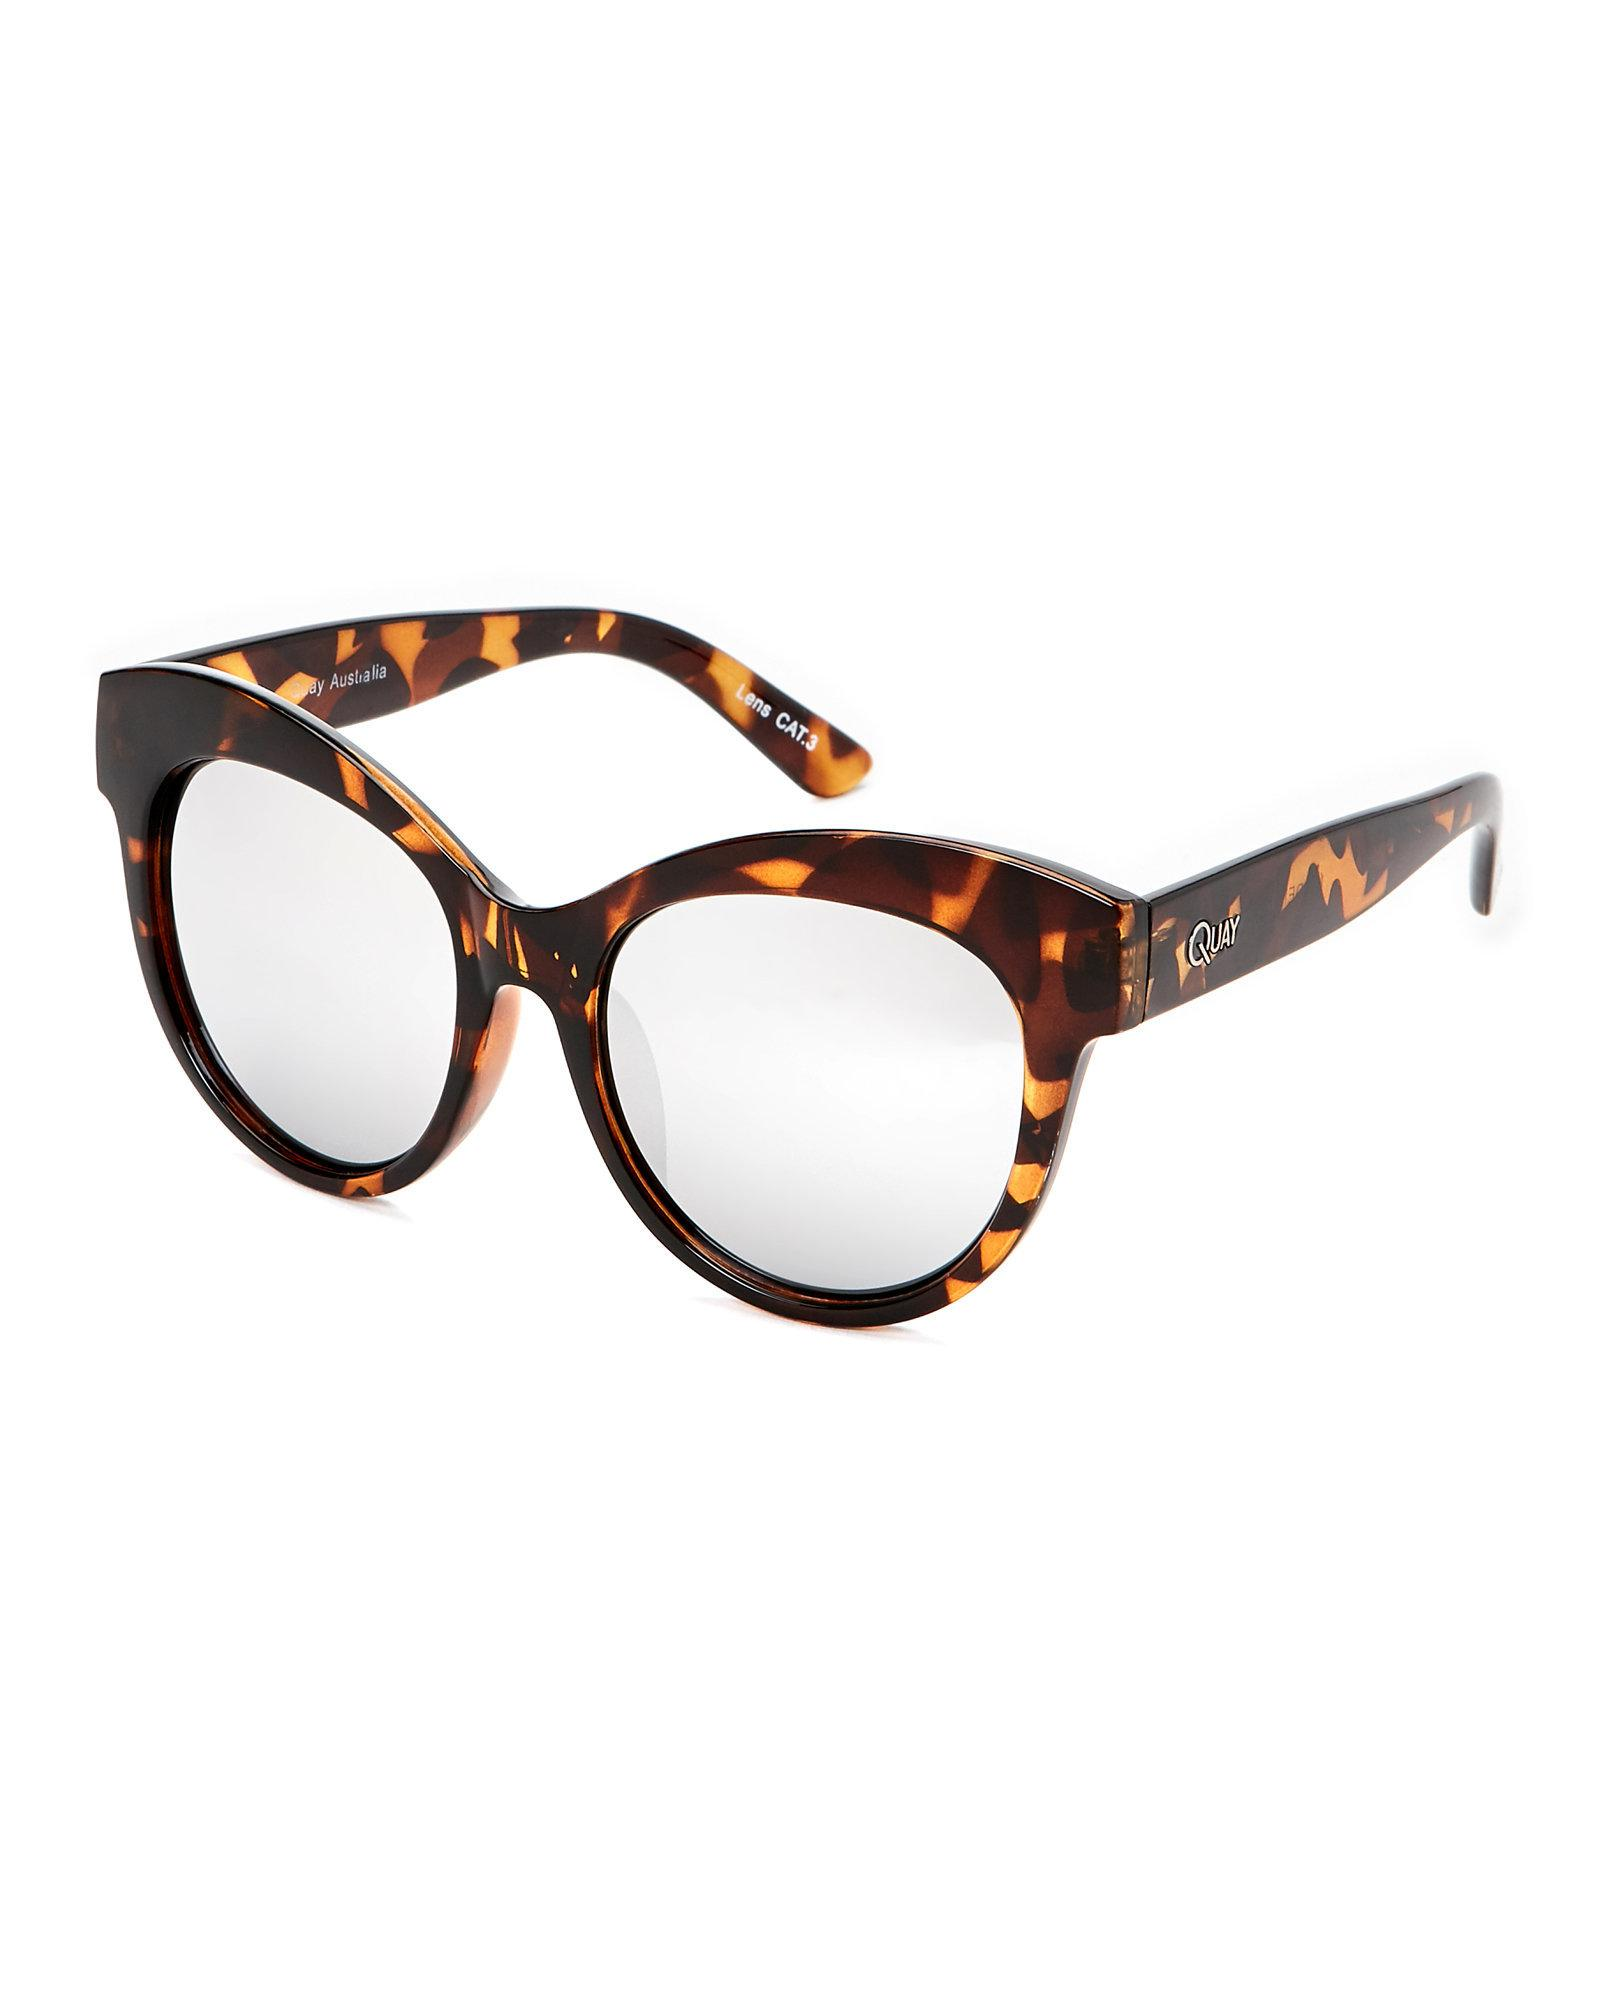 41a8db0954d67 Lyst - Quay Tortoiseshell-Look Maiden Cat Eye Sunglasses in Brown